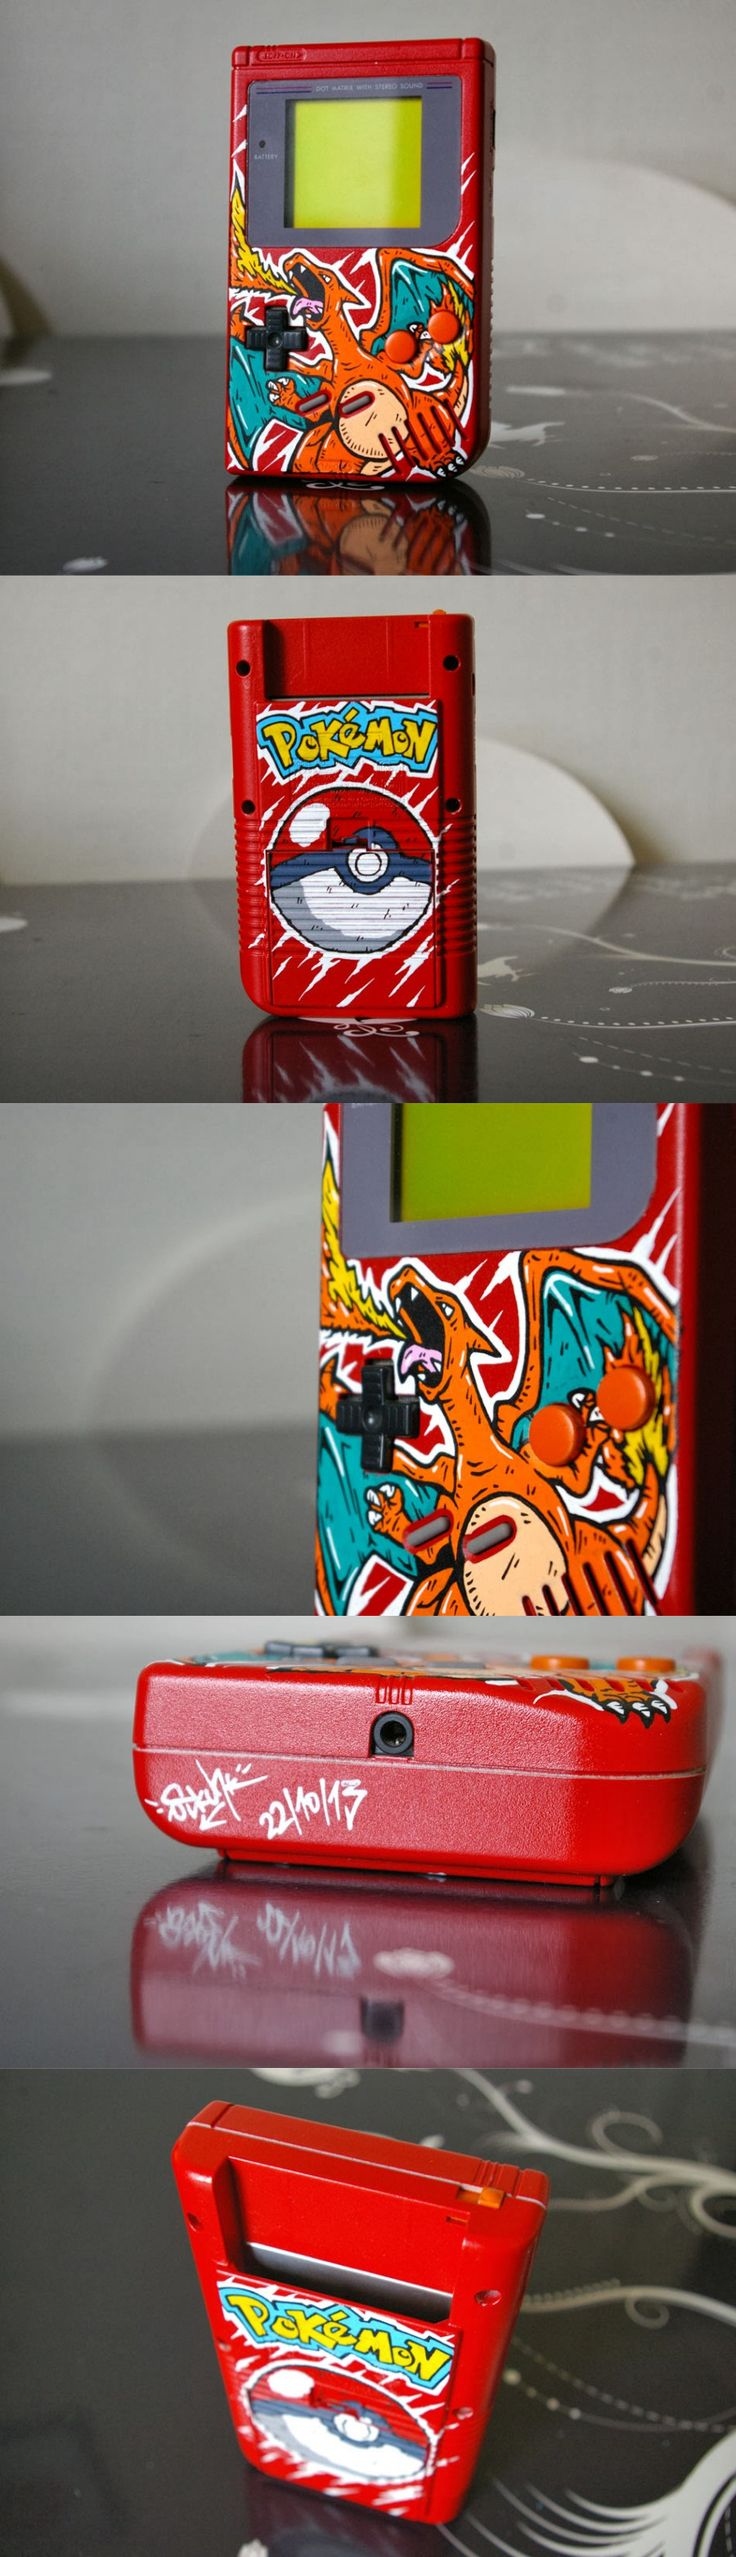 Awesome custom Pokemon Game Boy